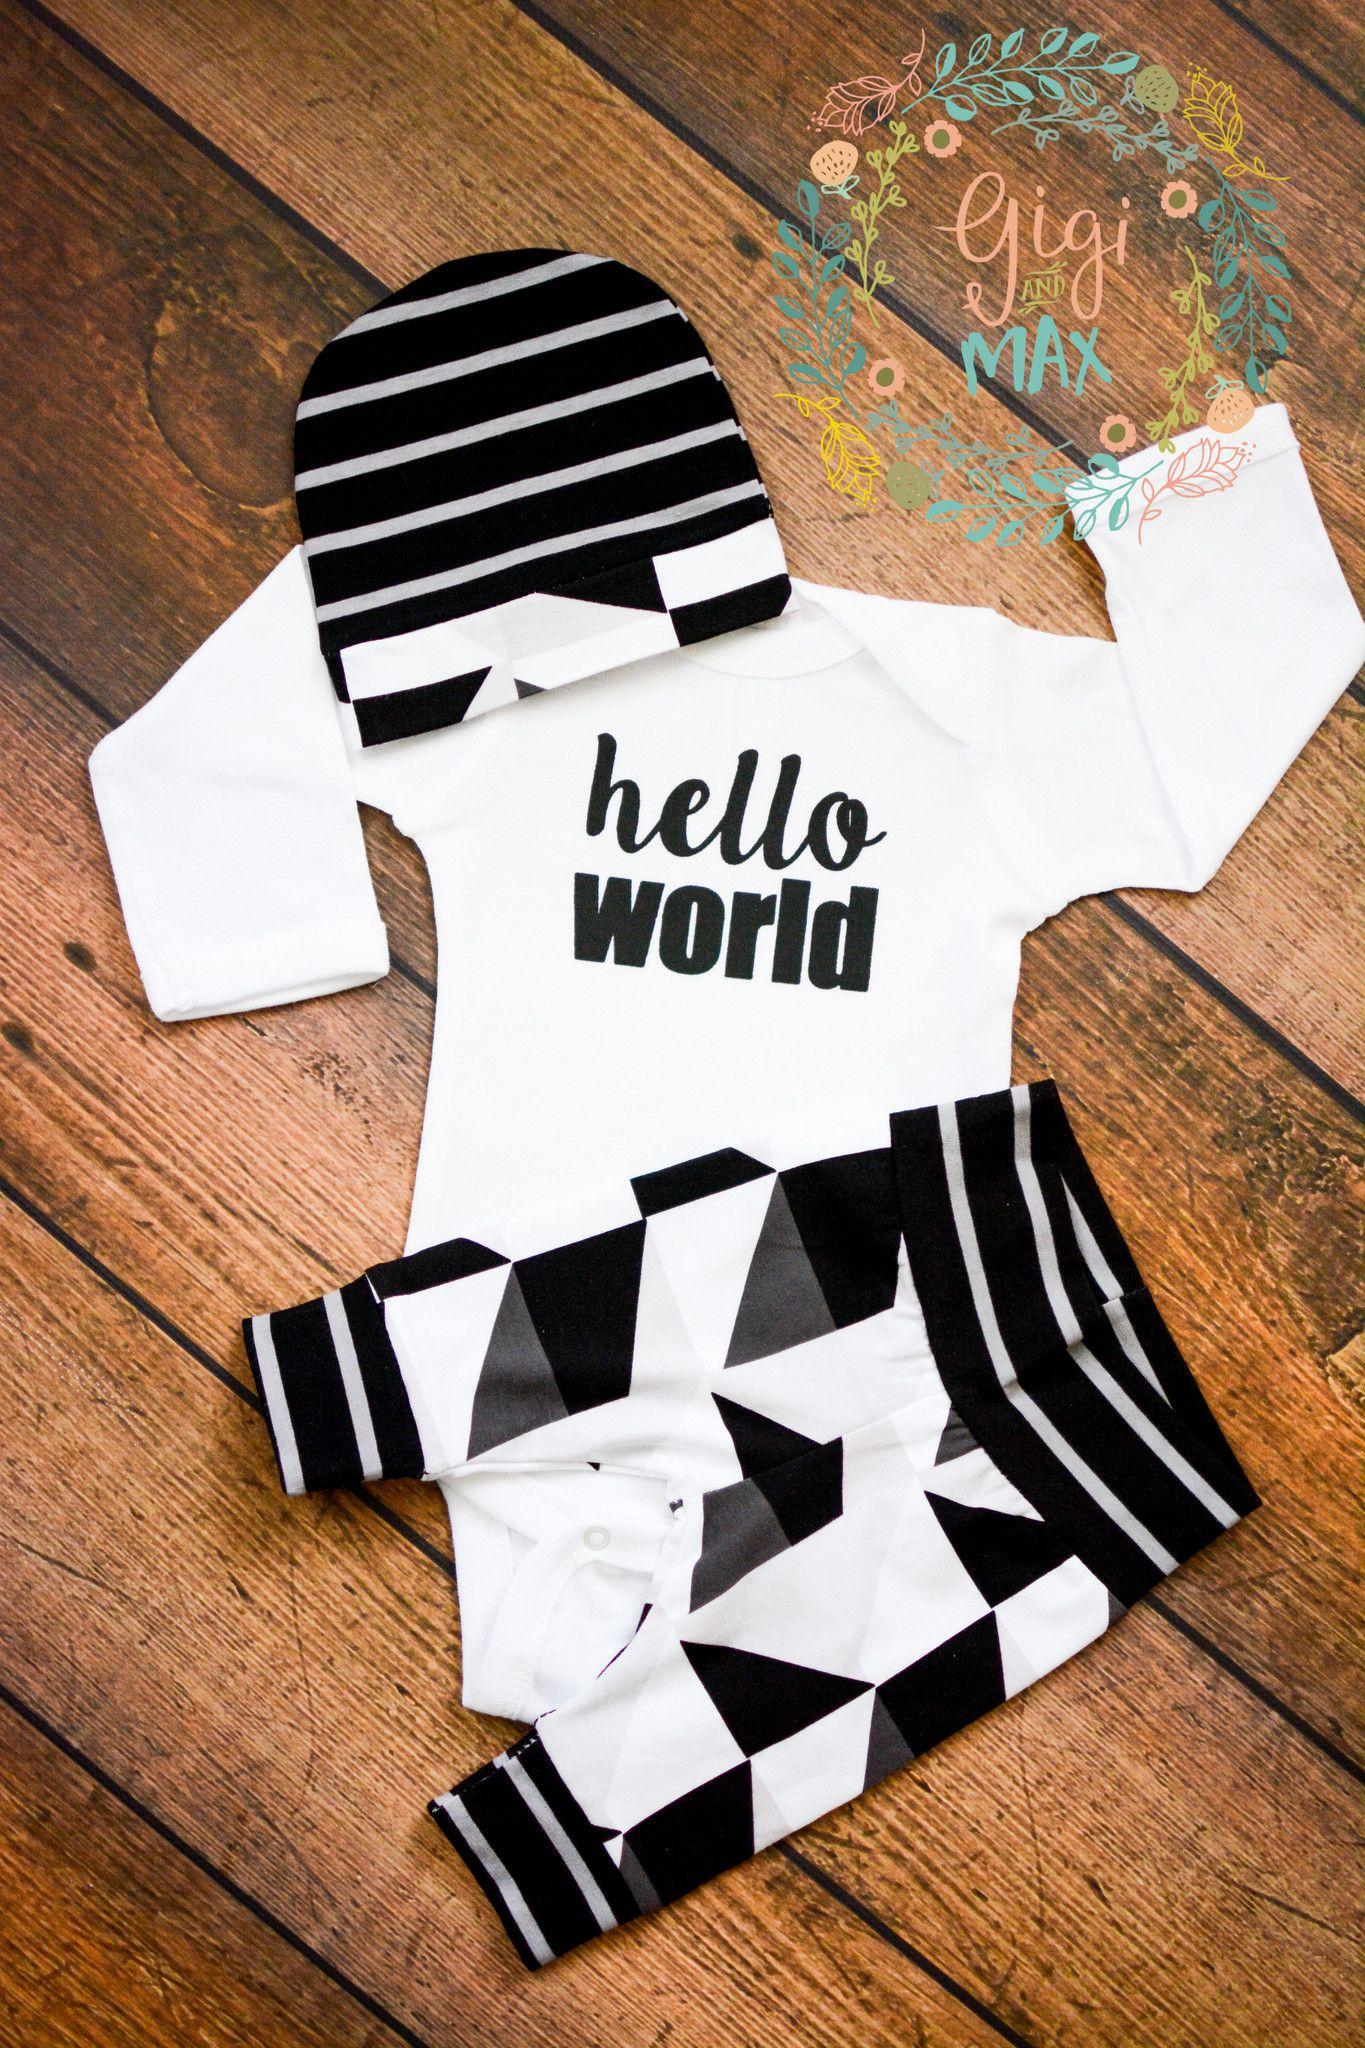 Go Hello World: Hello World Black And Gray Triangle Theme Newborn Outfit